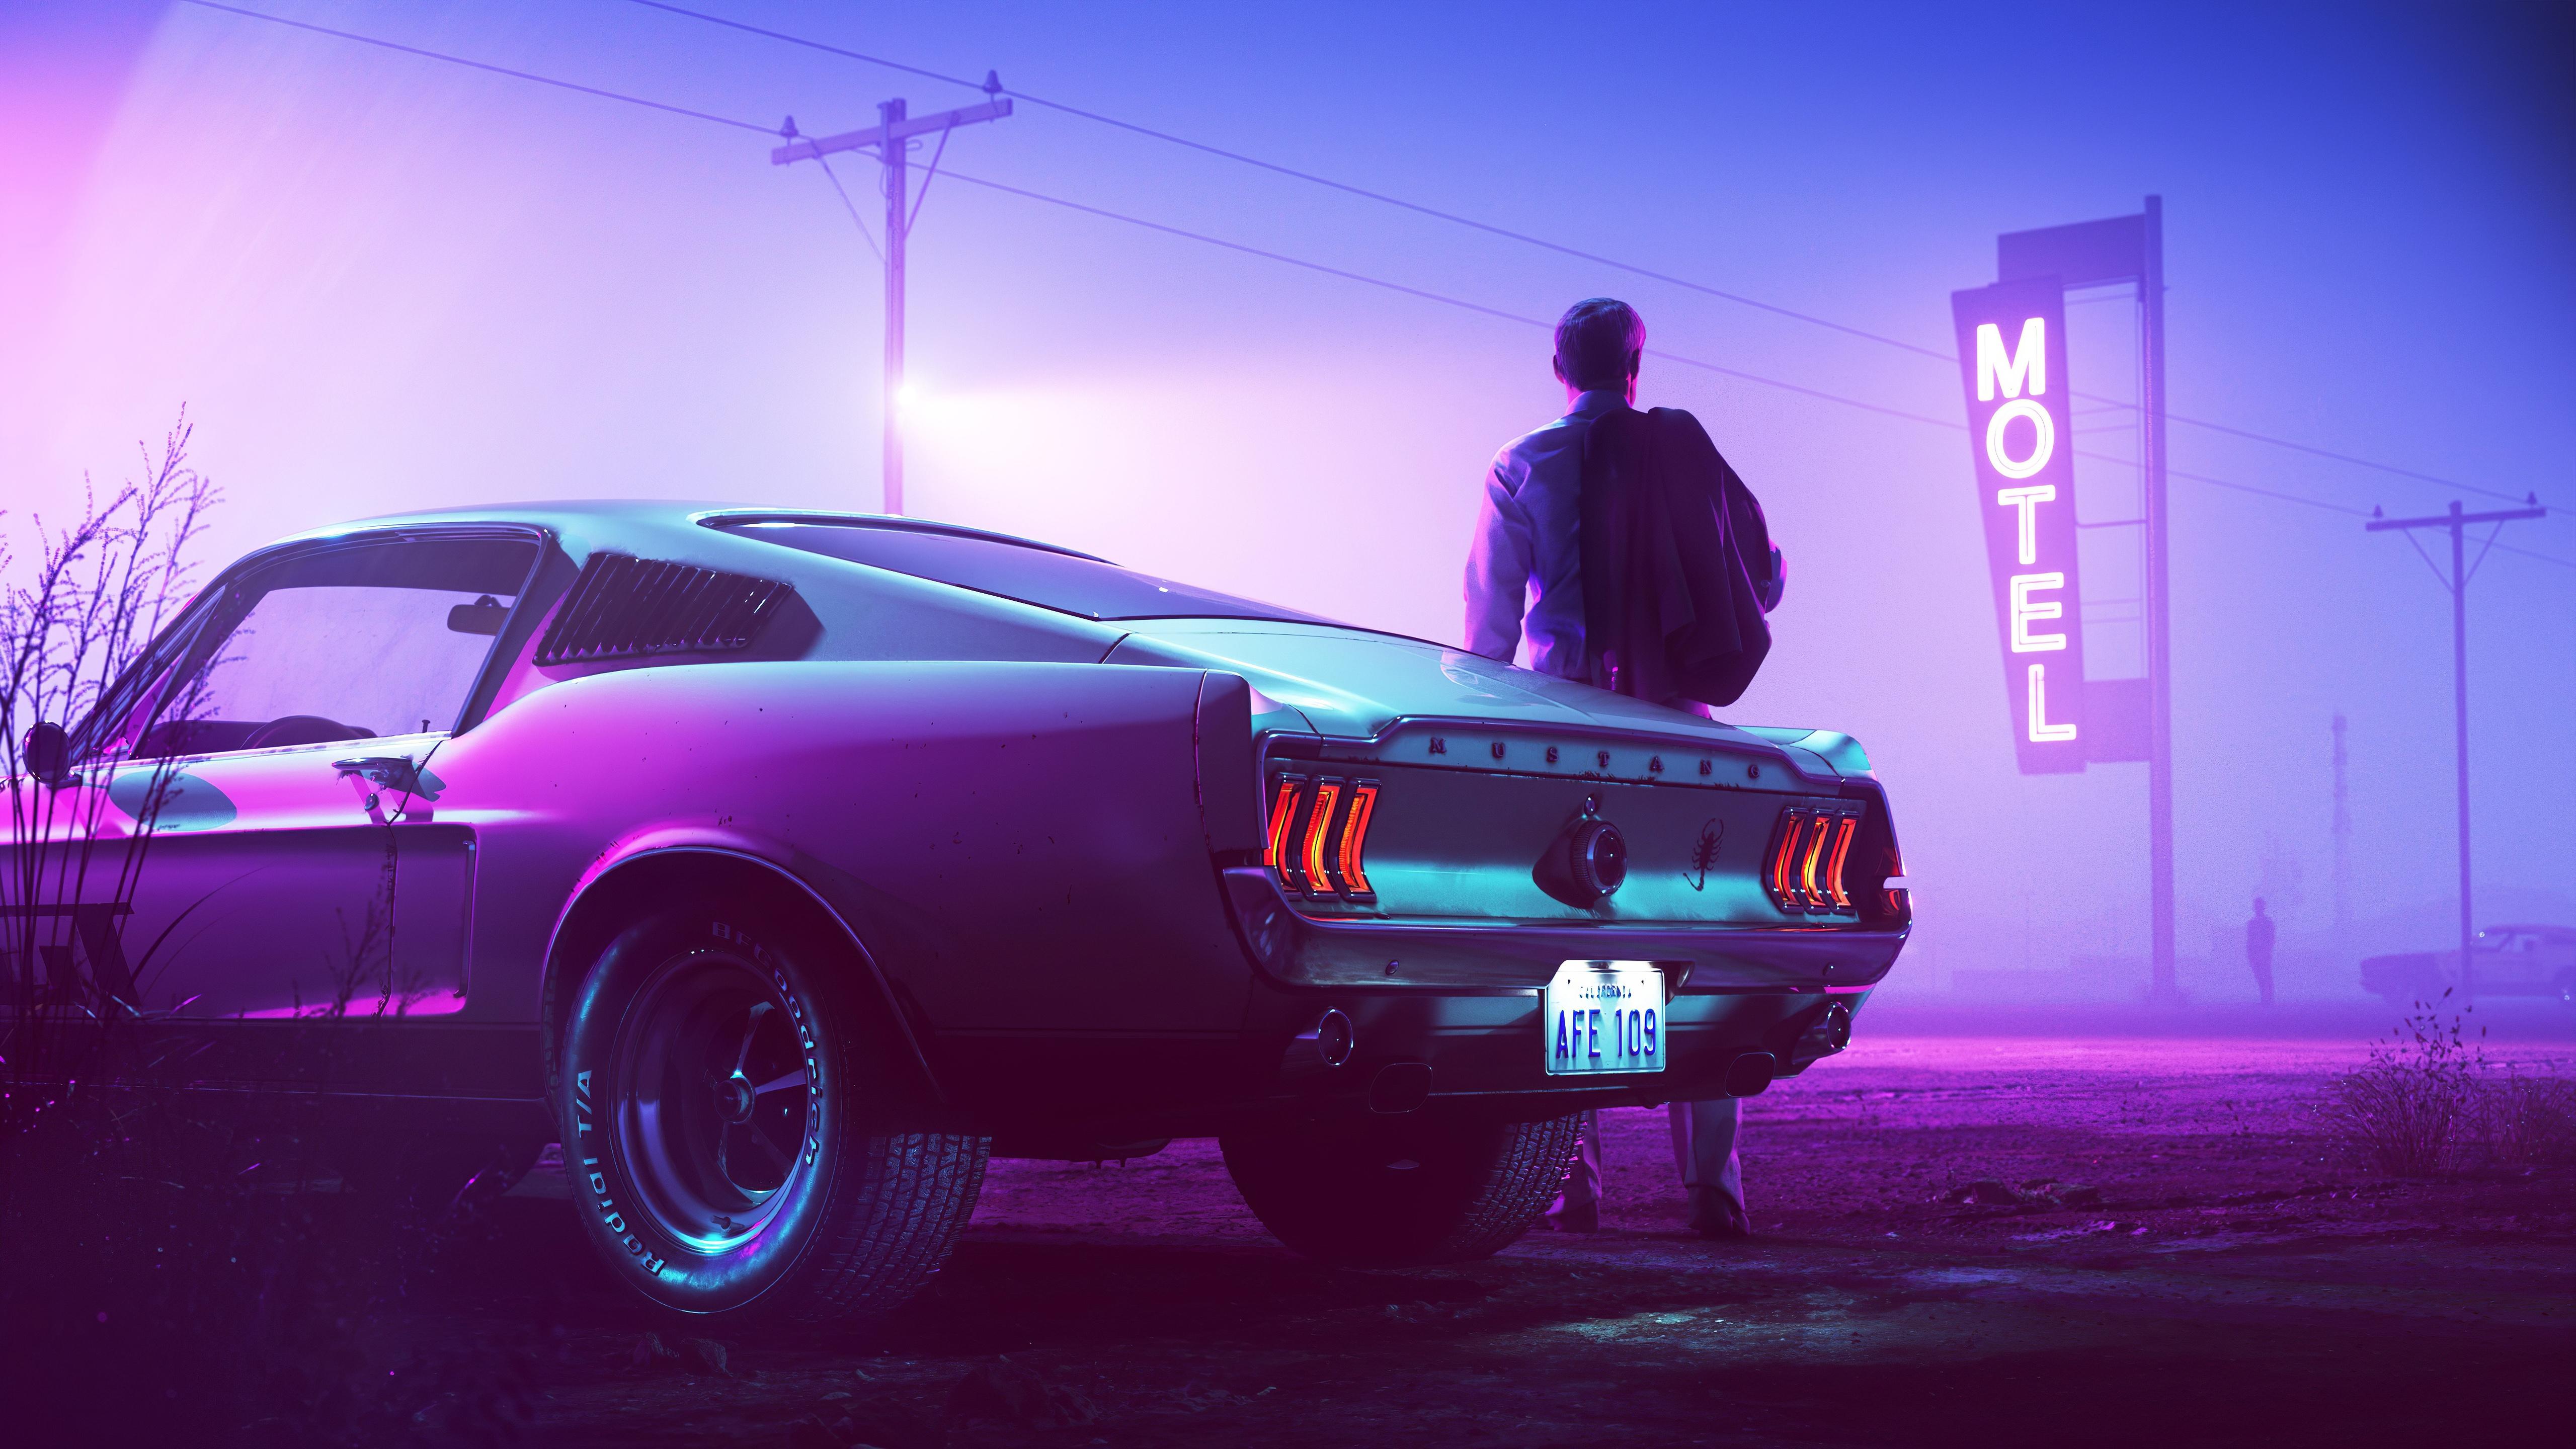 Retrowave Neon Mustang Driver 5k Wallpaper Title   Neon Car 5120x2880